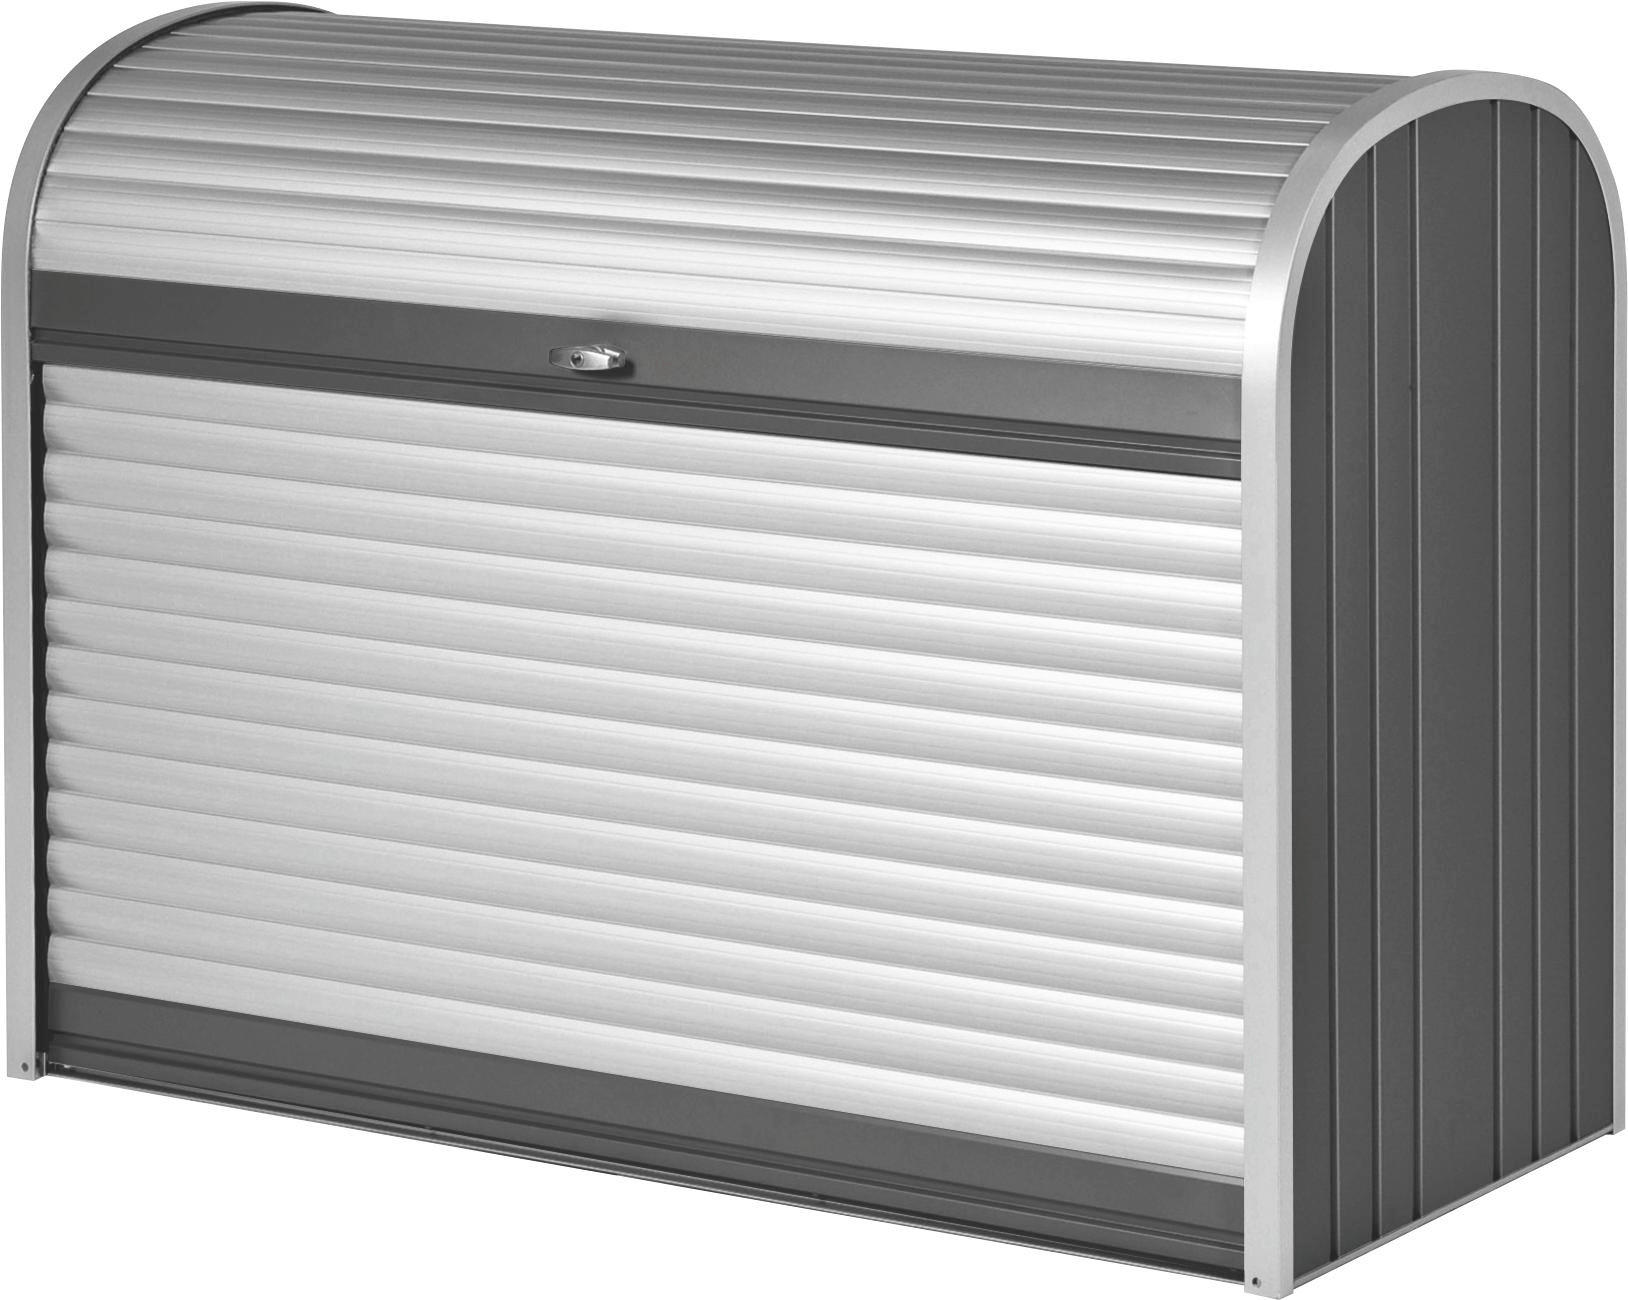 AUFBEWAHRUNGSBOX - Dunkelgrau/Silberfarben, Design, Metall (163/120/78cm)